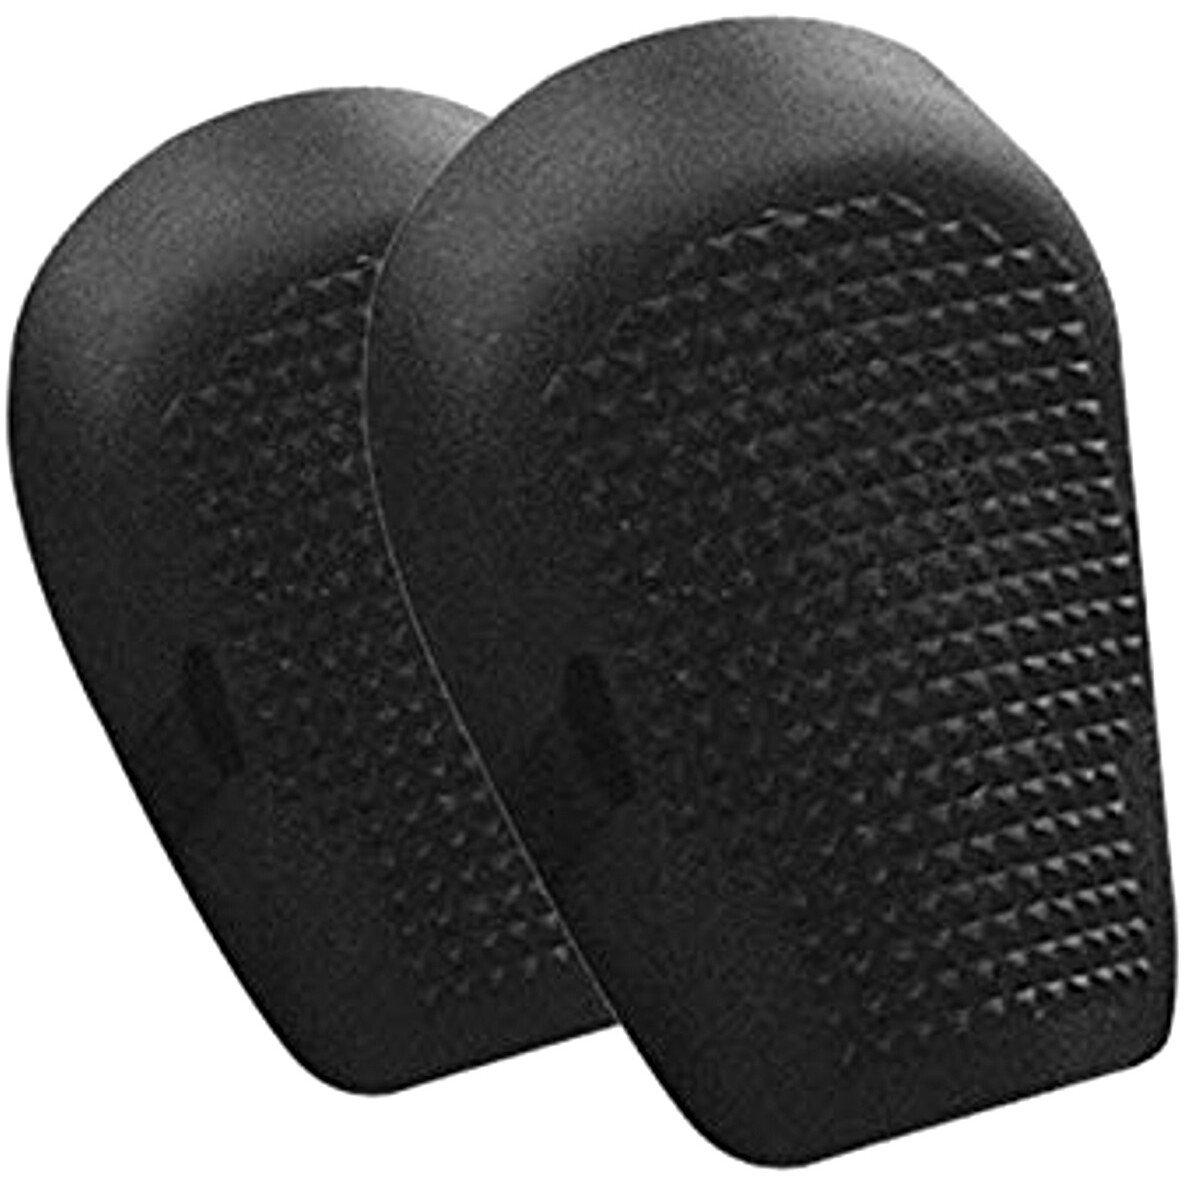 JSP ACU150-011-000 Flexible Black Rubber Knee Pads Pair